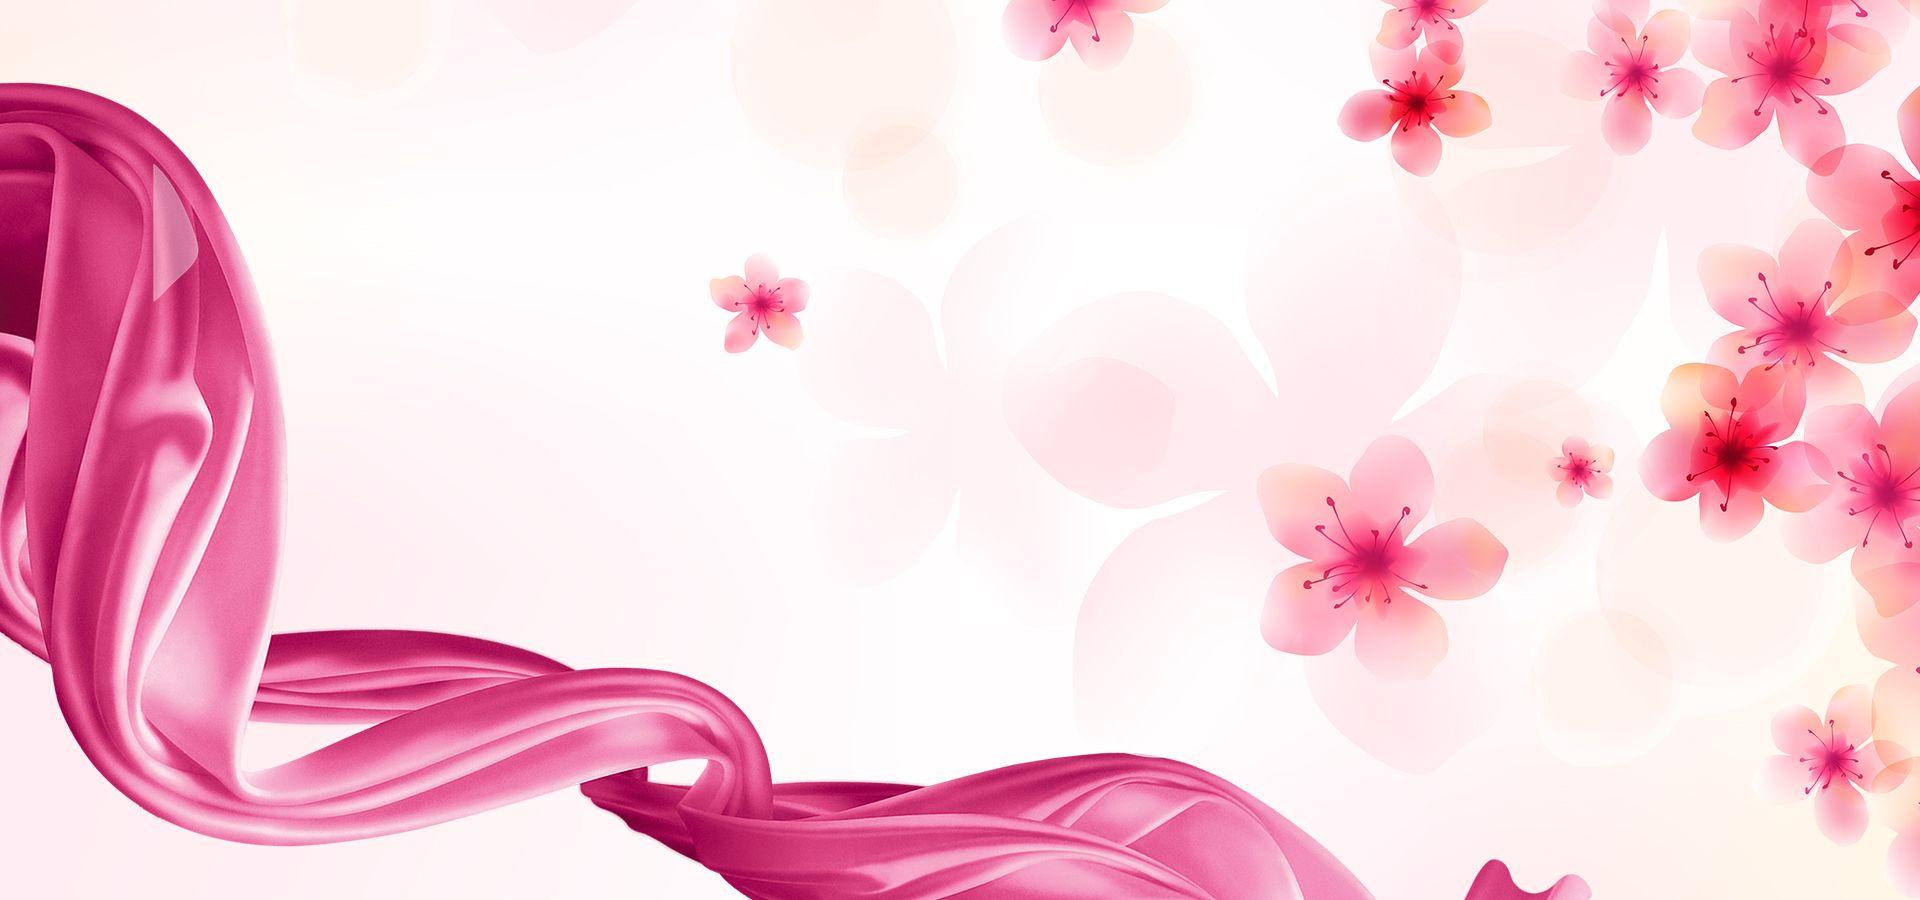 Romantic Pink Flowers Wedding Background Romantic Background